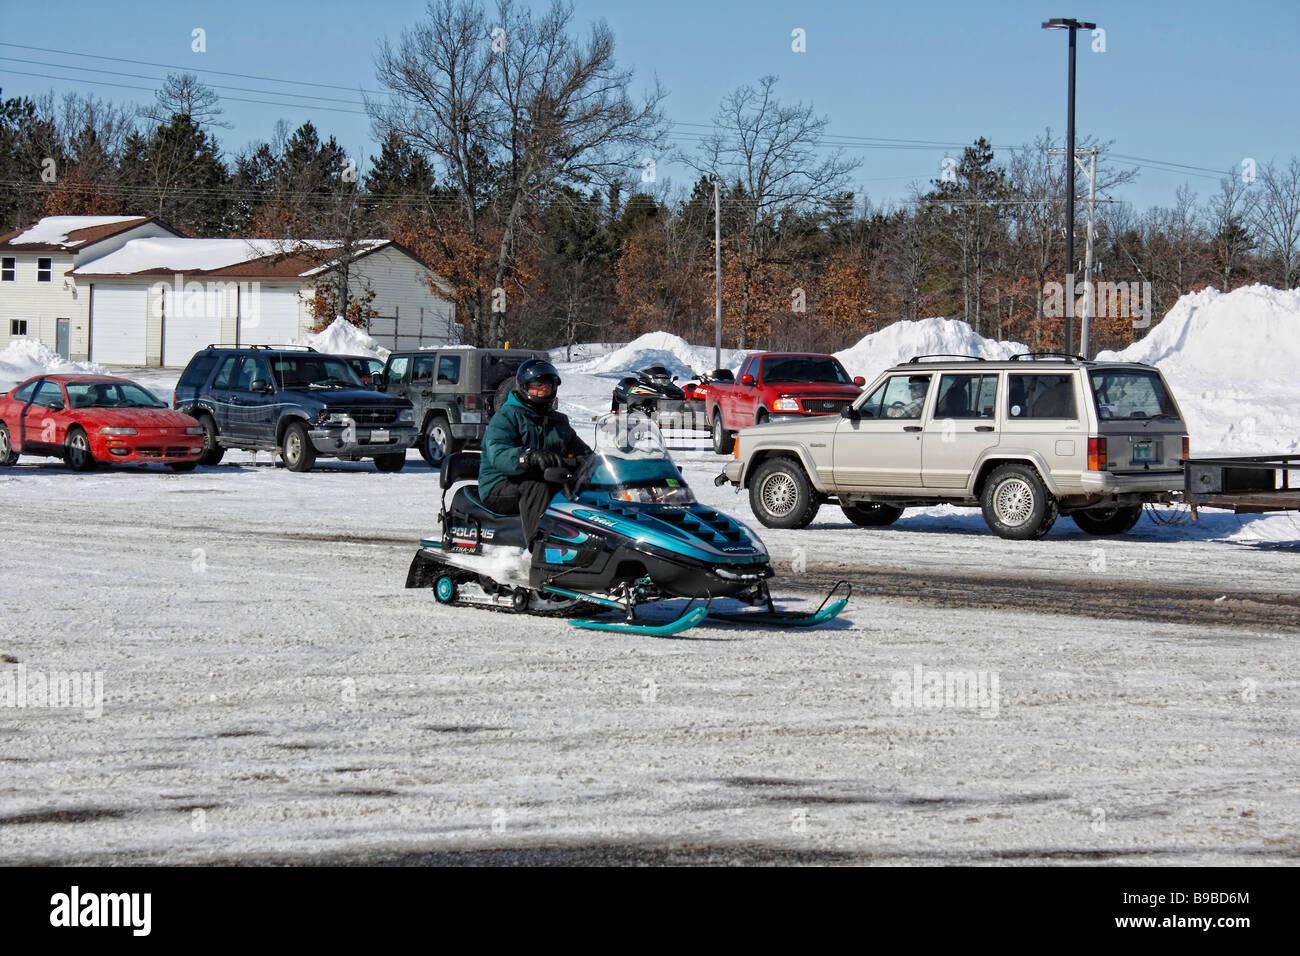 Snowmobile with snowmobiler on the city Michigan USA - Stock Image